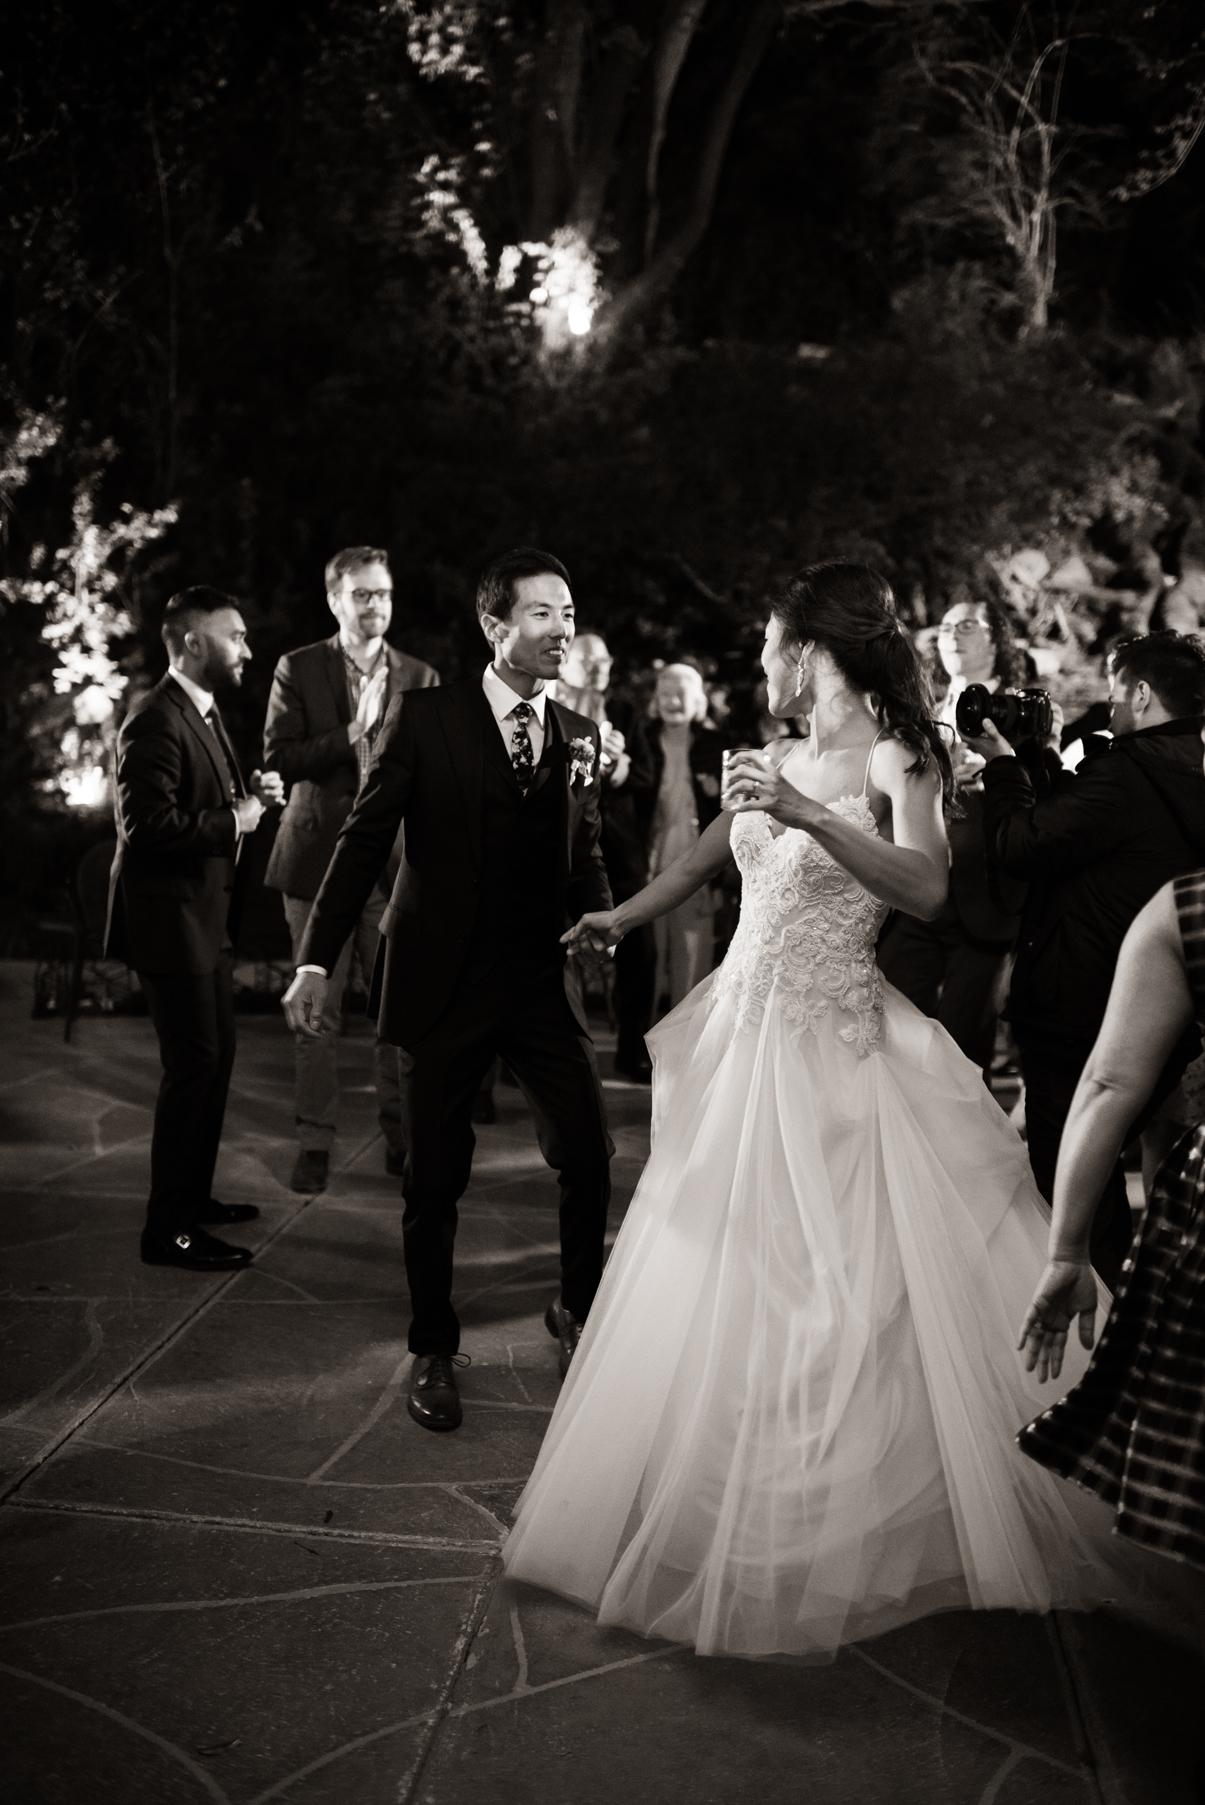 candid photography utah wedding party